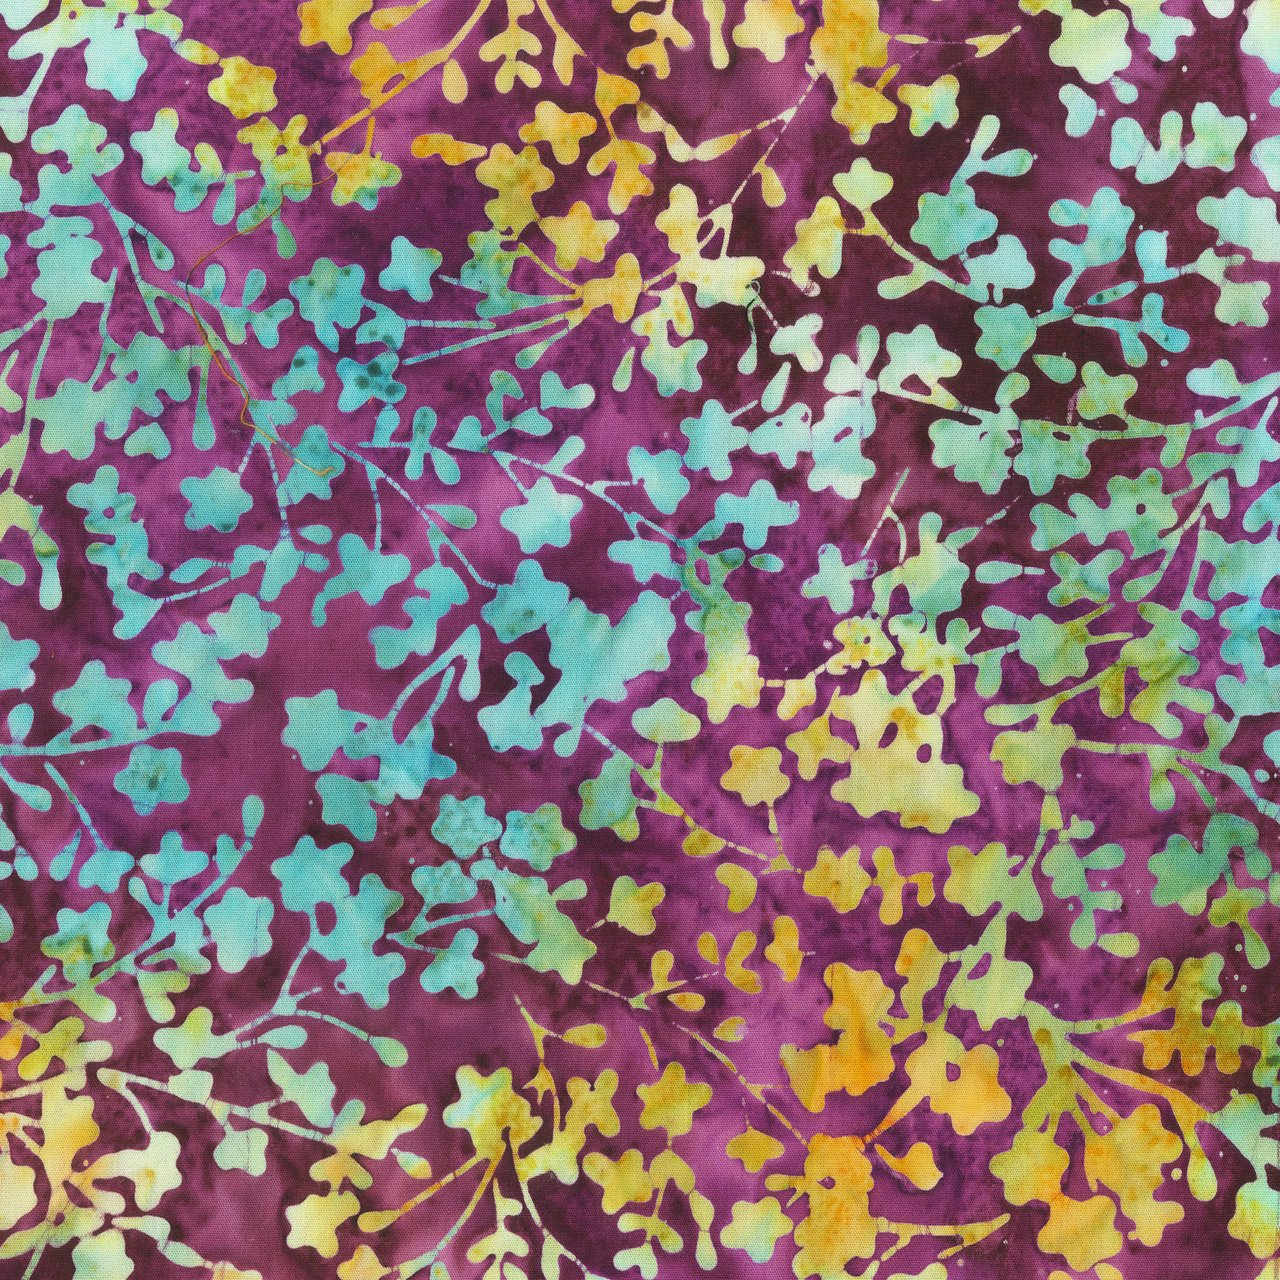 2019Q-5 Art Inspired: Northern Blooms by Erin Hanson